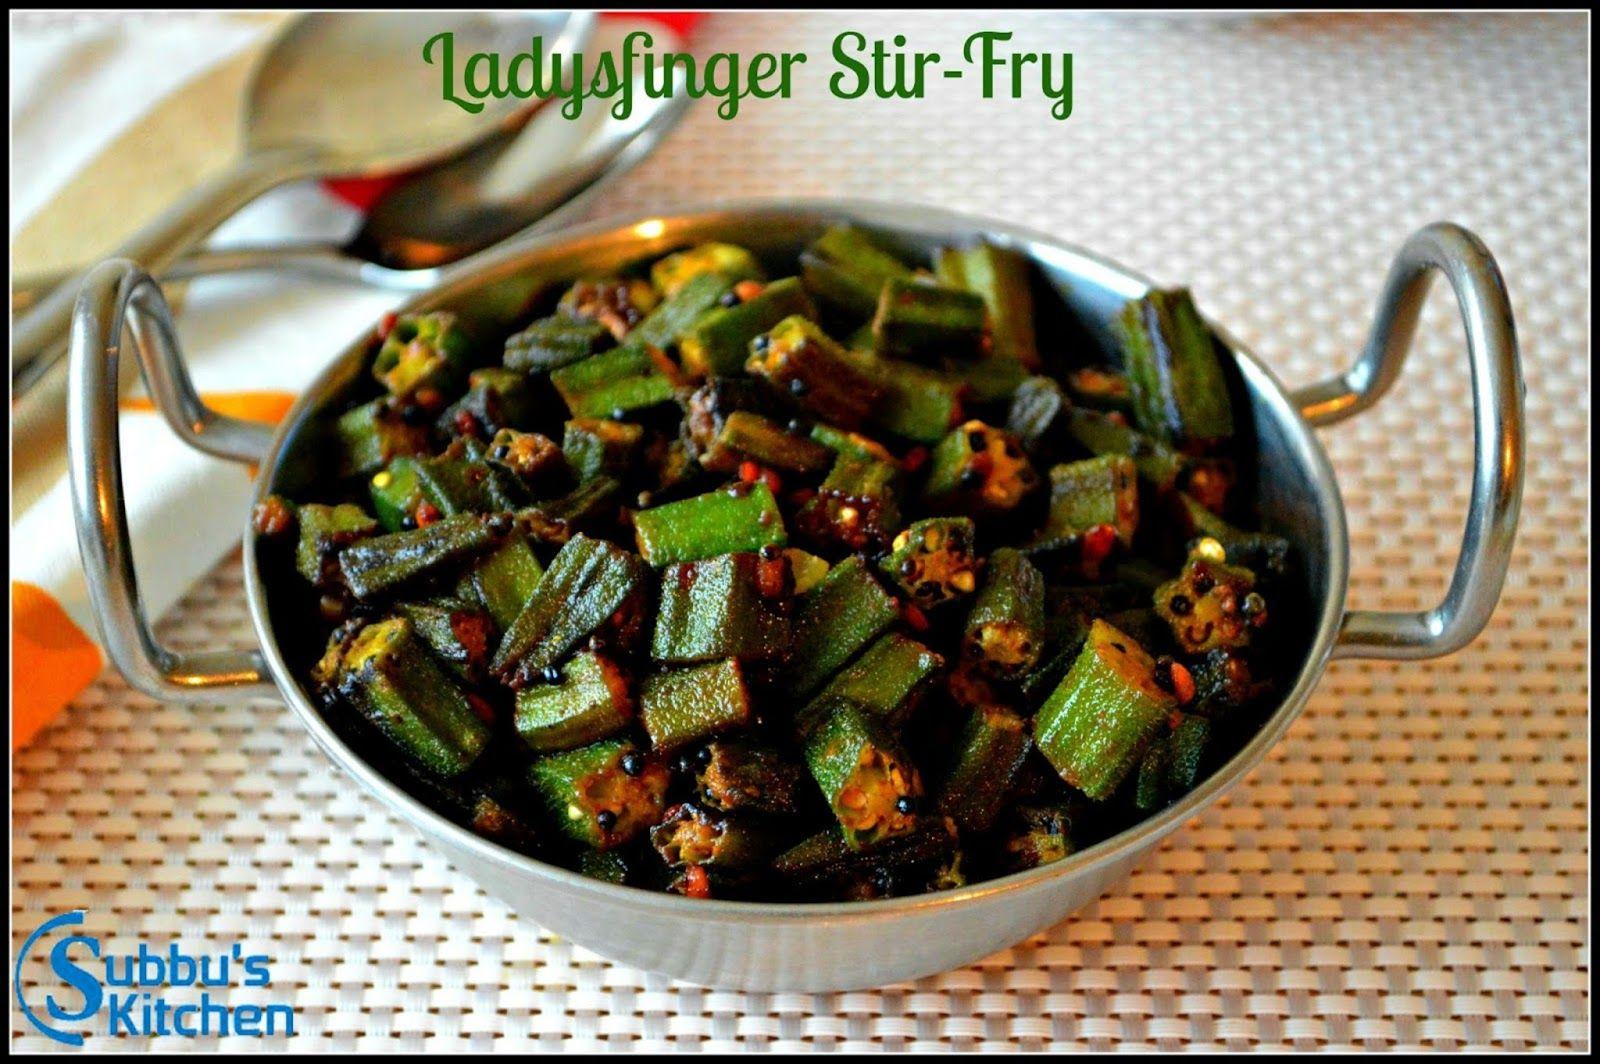 South Indian Lunch Menu 20 Bonda Morkuzhambu Drumstick Rasam Ladysfinger Fry Papad And Plain Rice Stir Fry Lunch Menu Fries